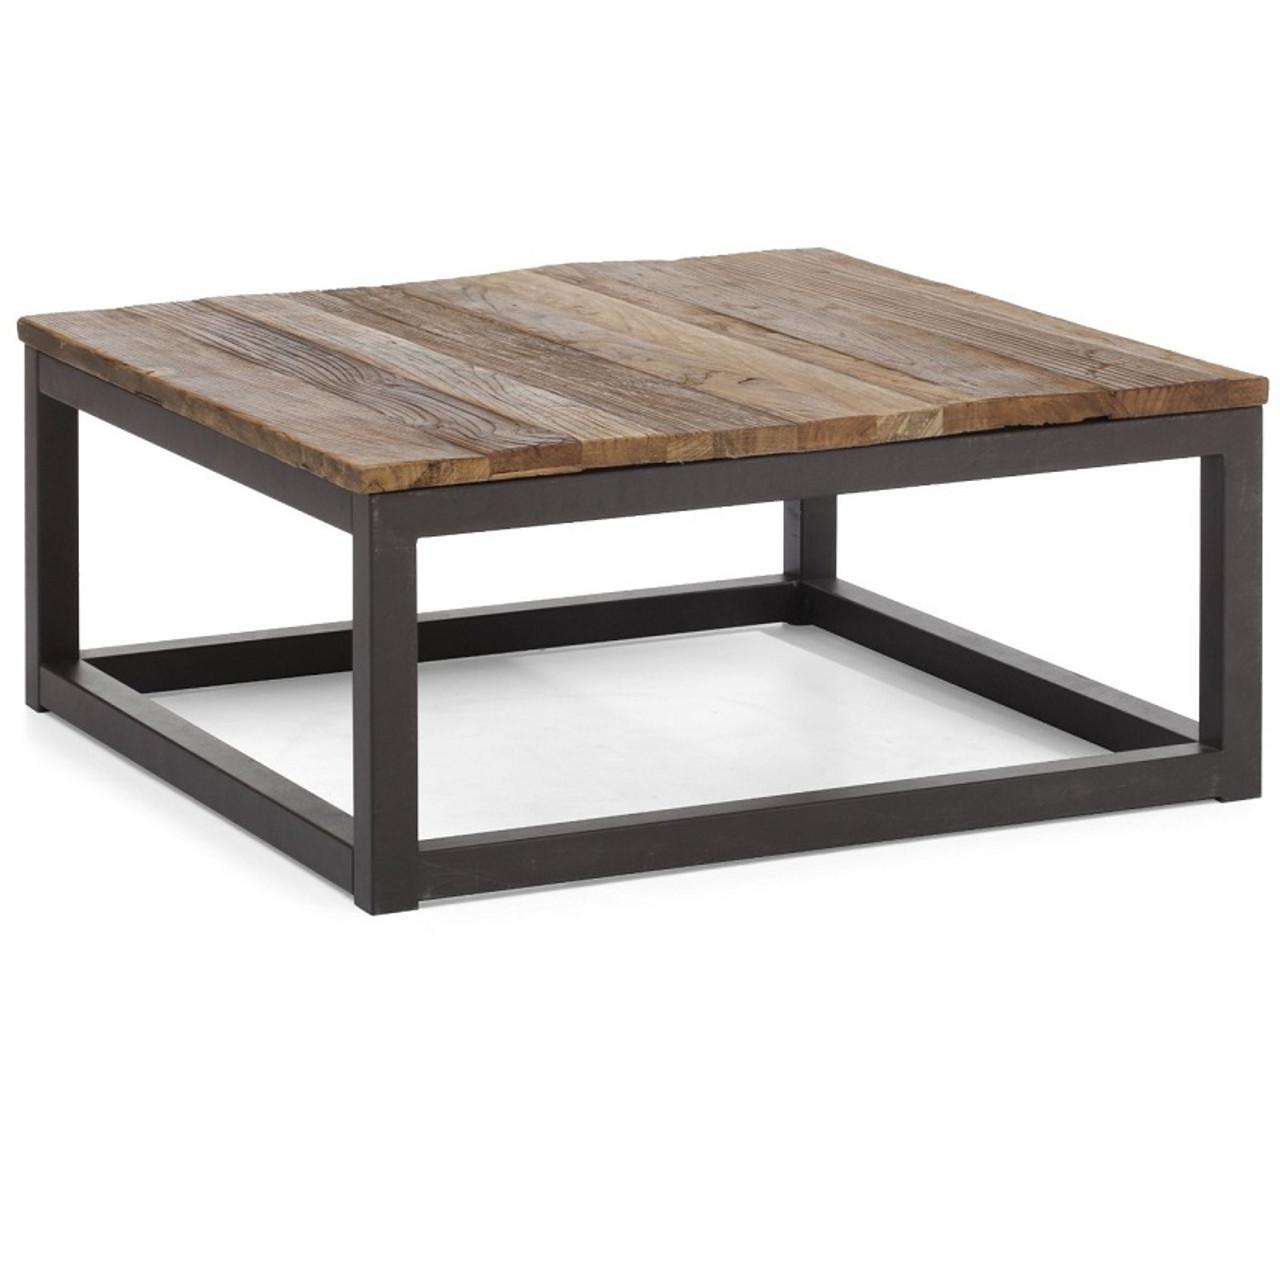 Civic Wood and Metal Coffee Table 43 Zin Home